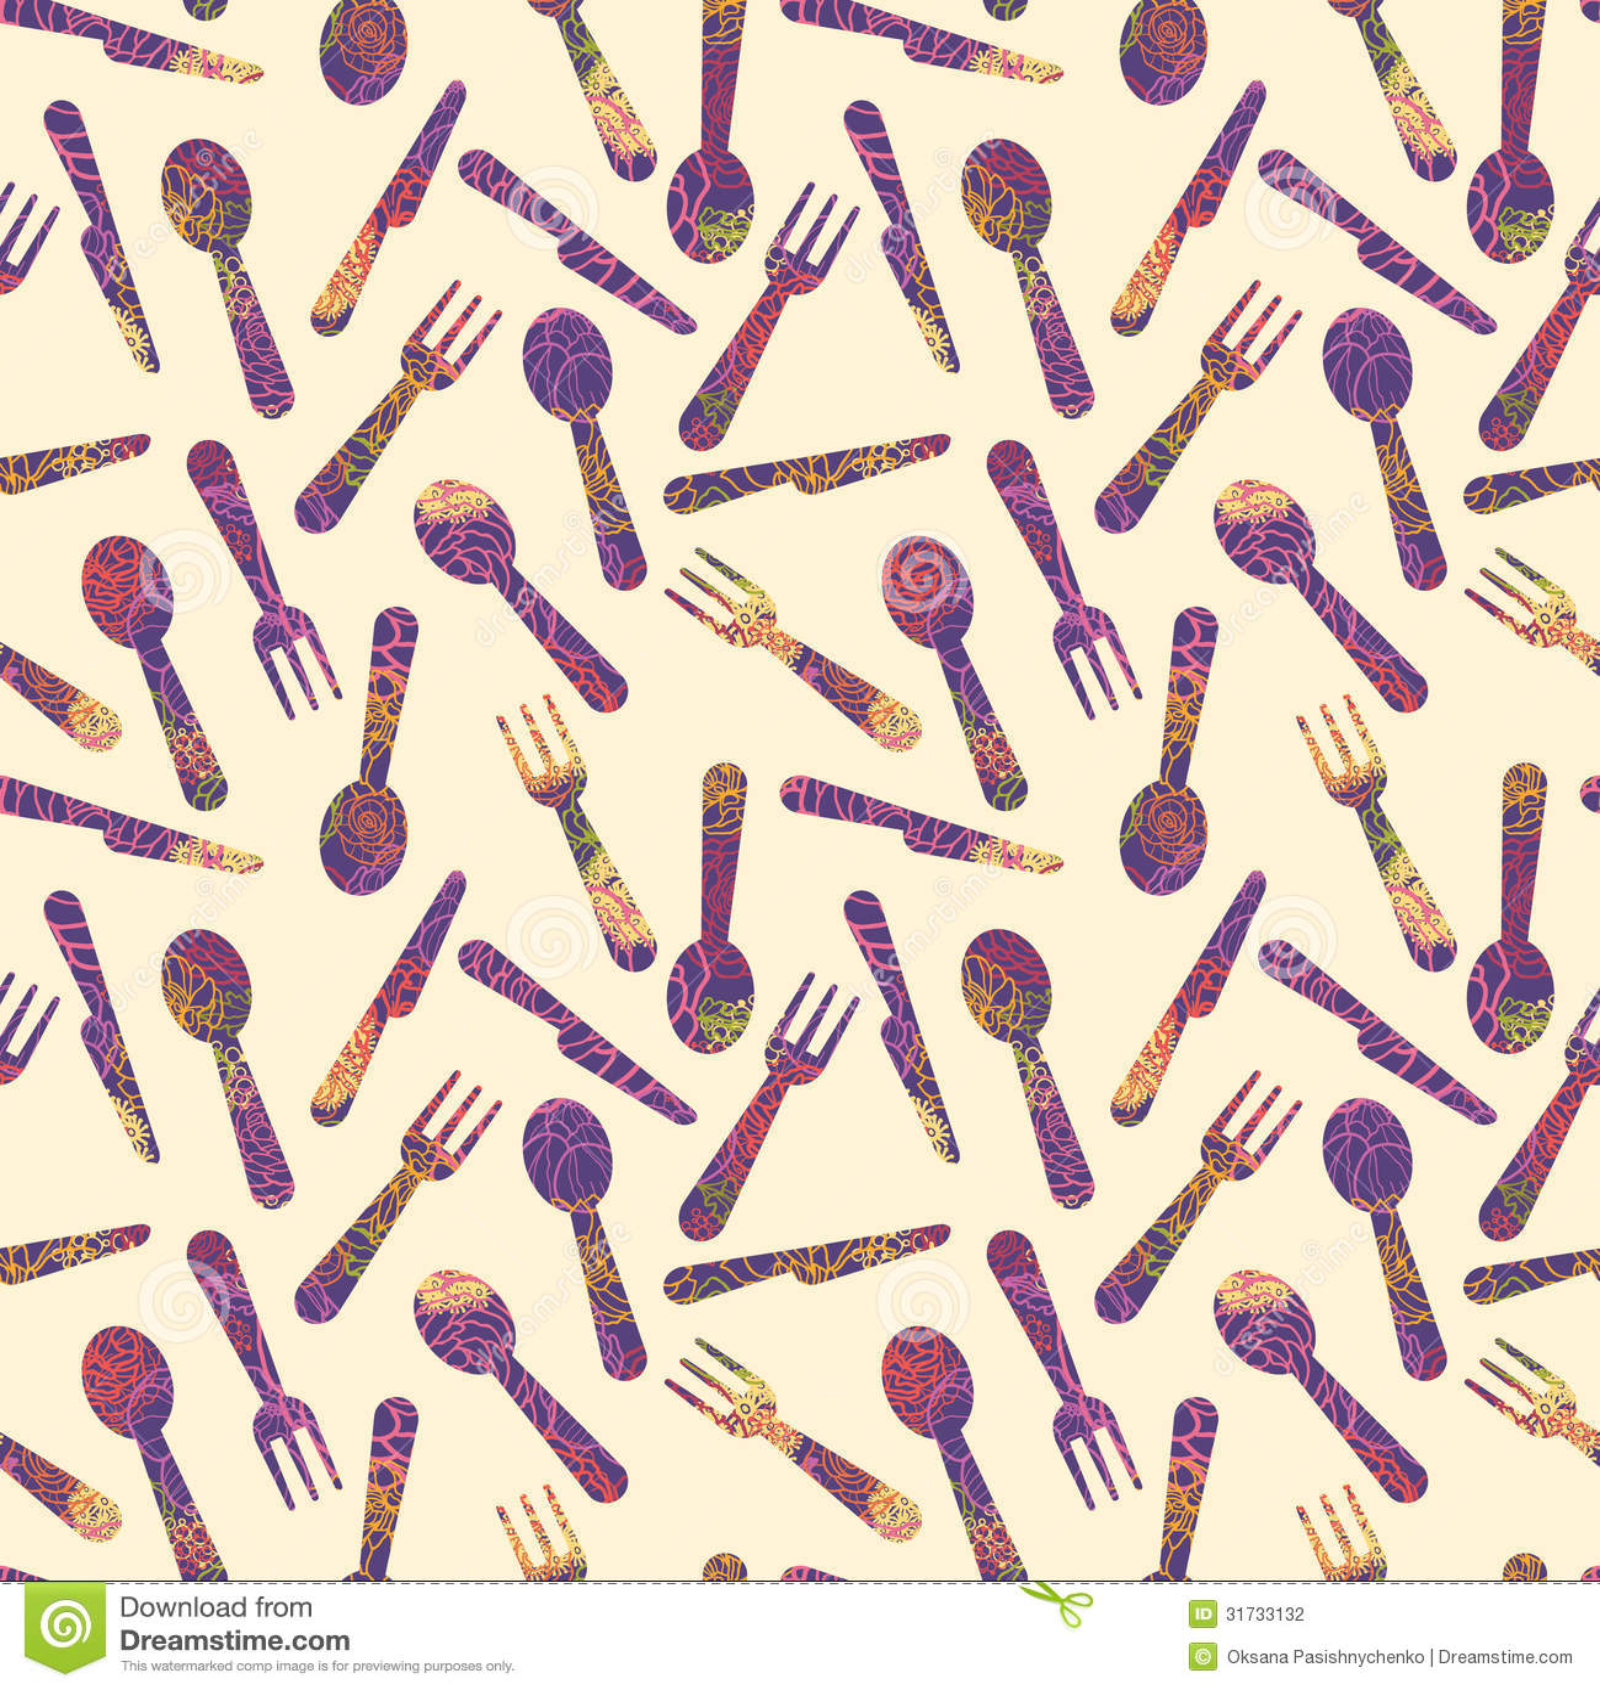 Textured Silverware Seamless Pattern Background Stock